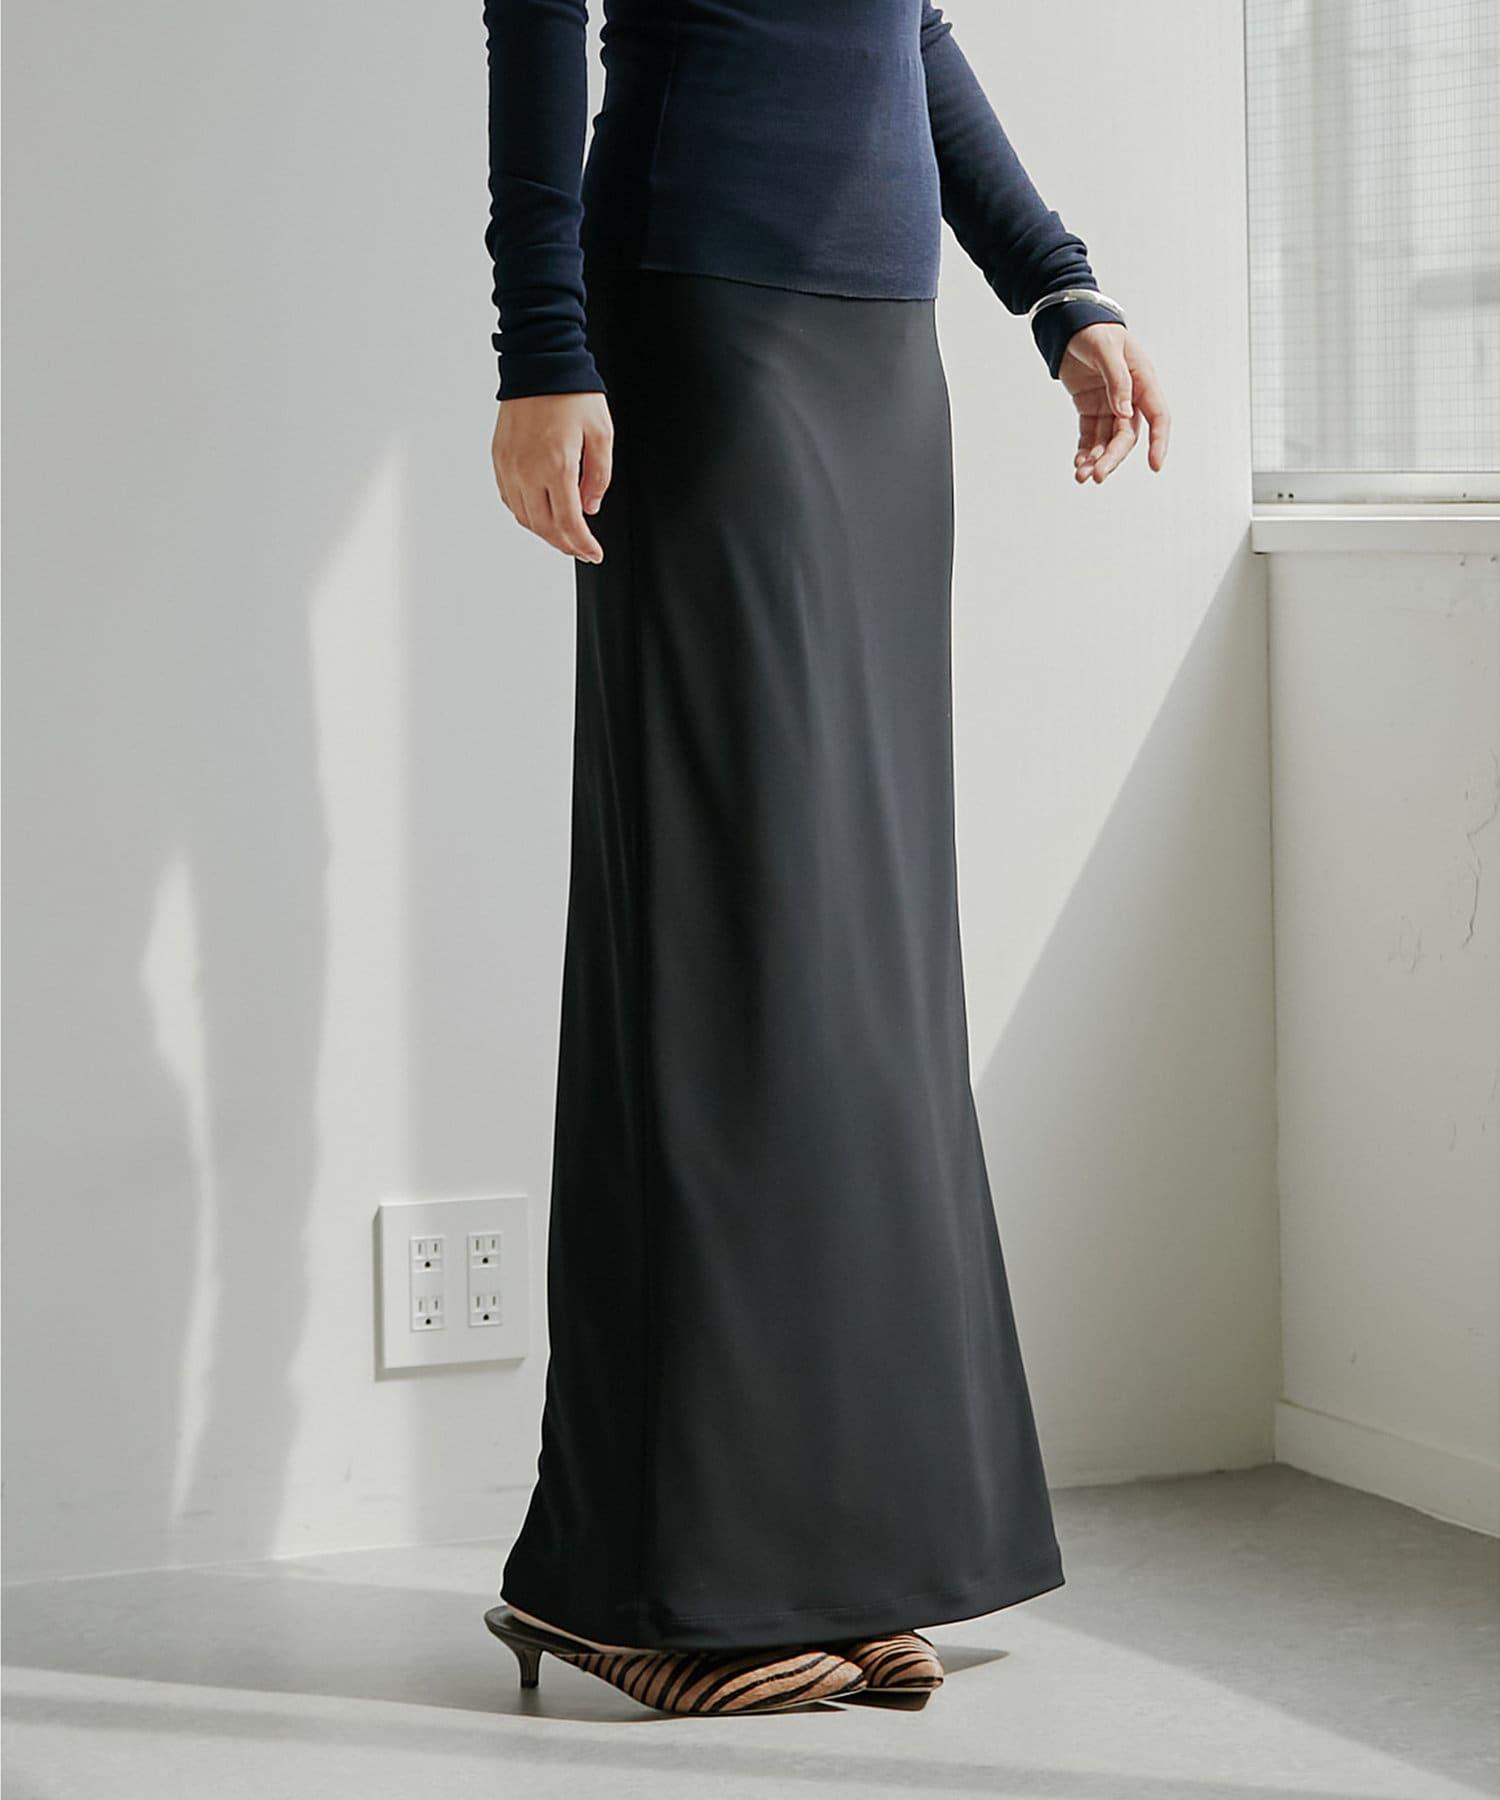 Whim Gazette(ウィム ガゼット) 【長谷川京子さんコラボ】スムーススリムスカート